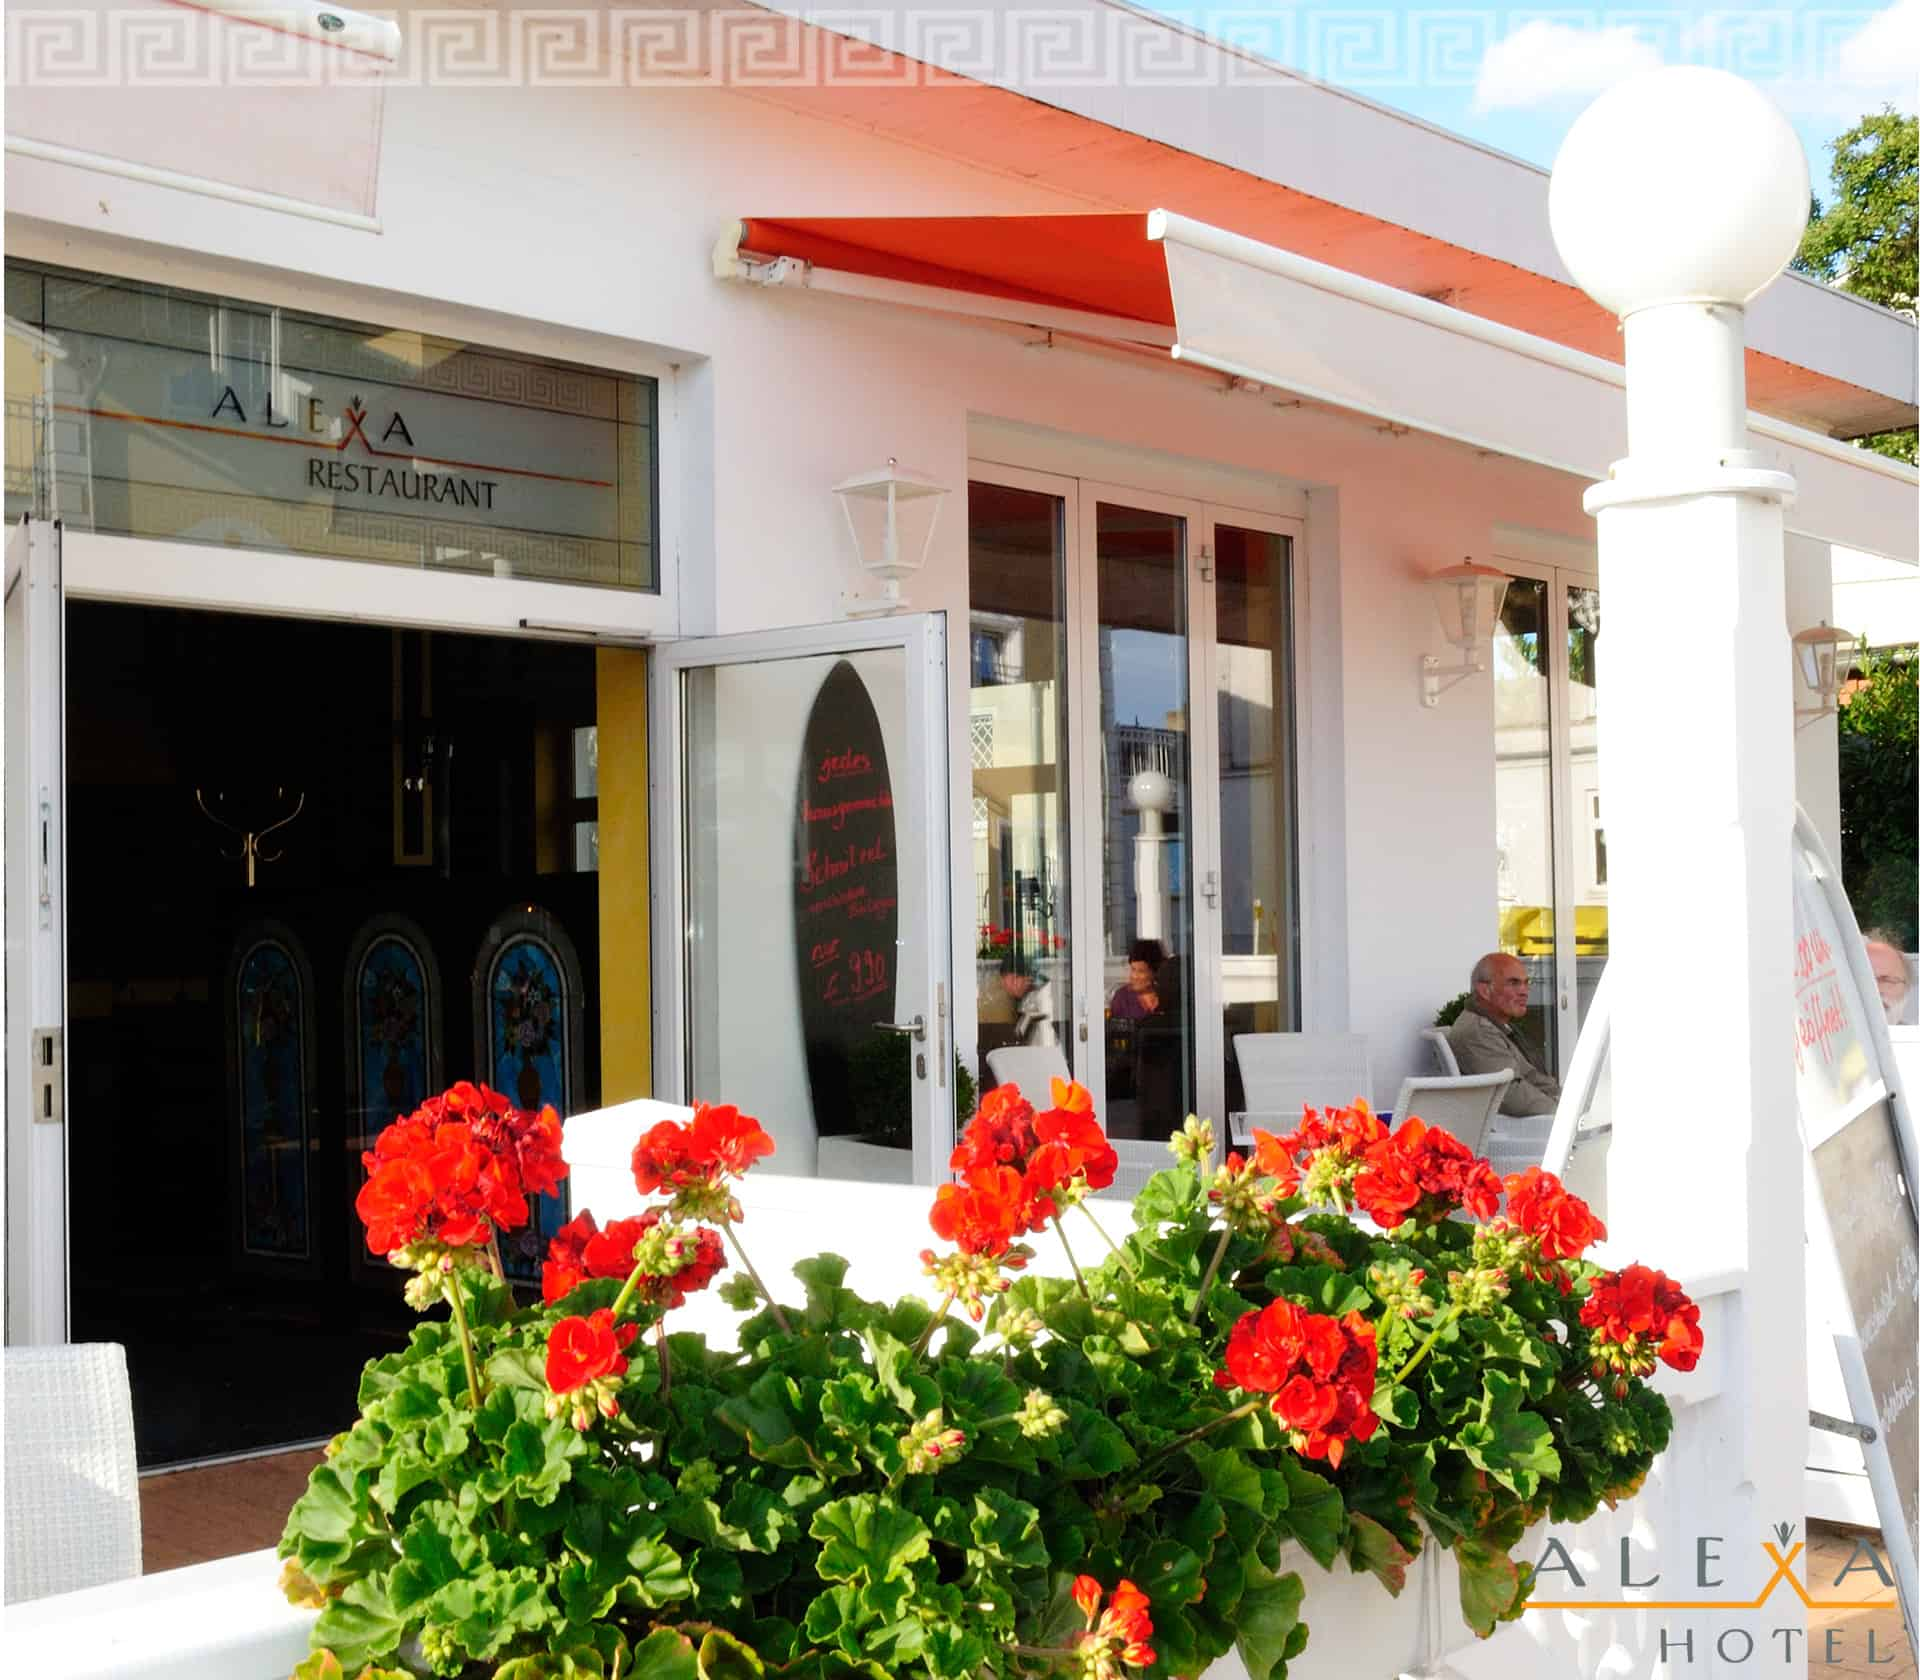 Restaurant Alexa